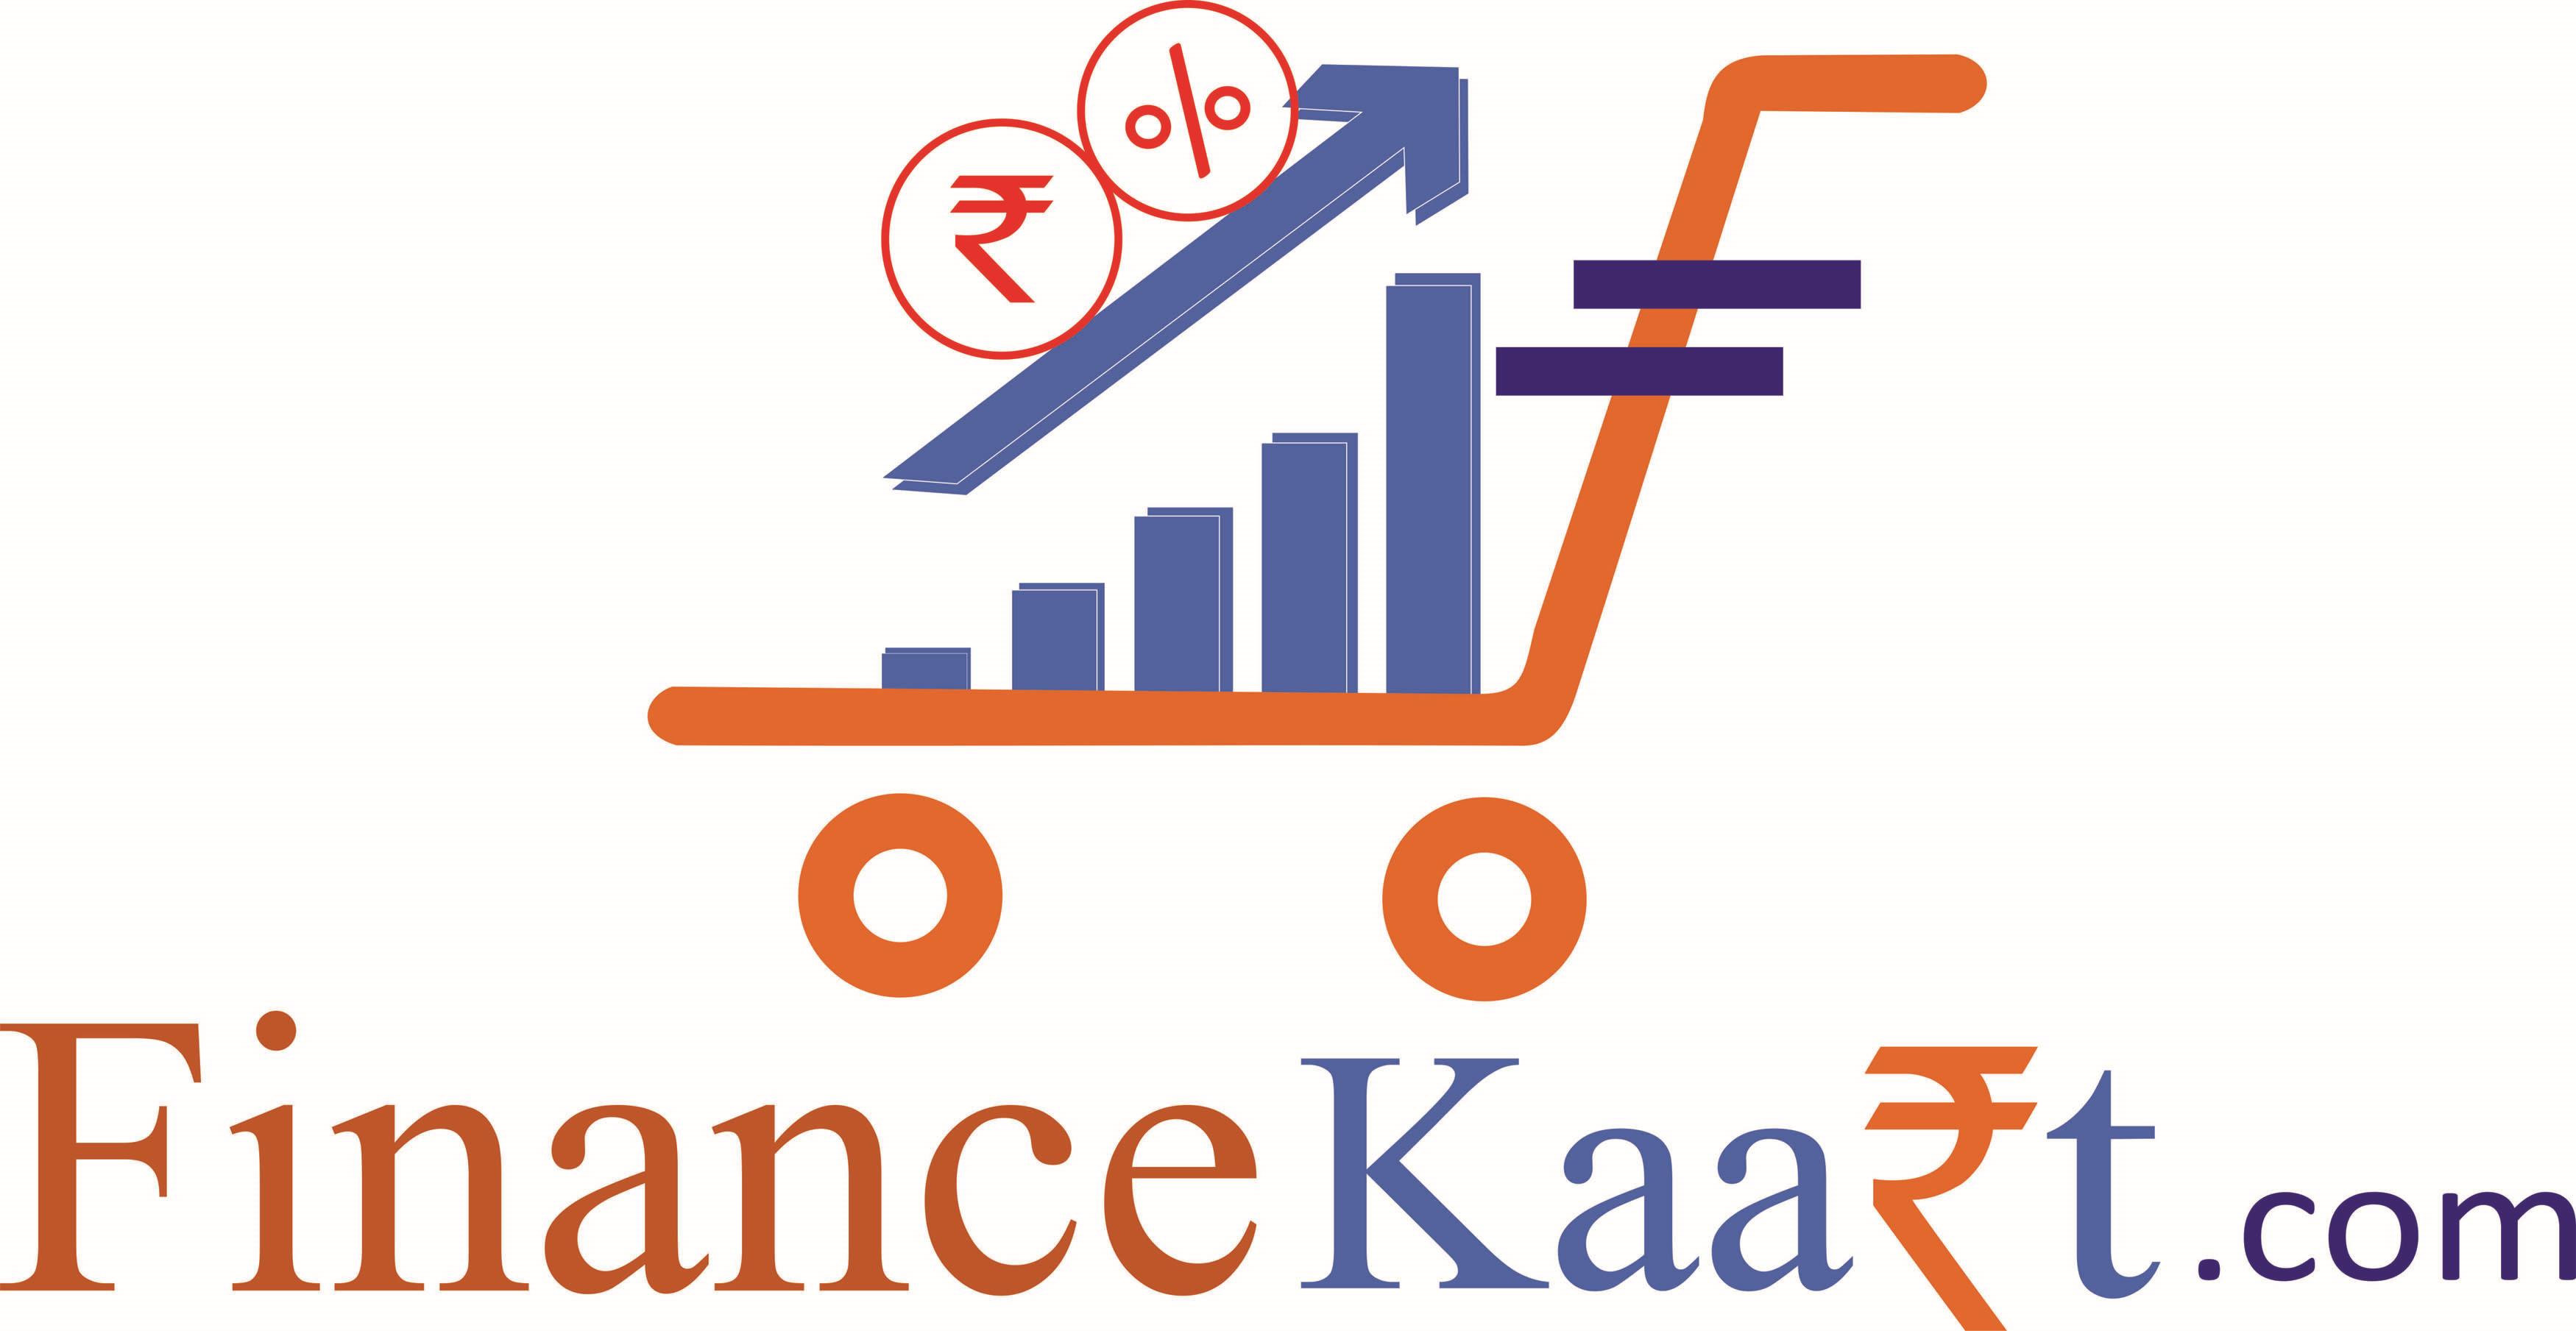 FinanceKaart